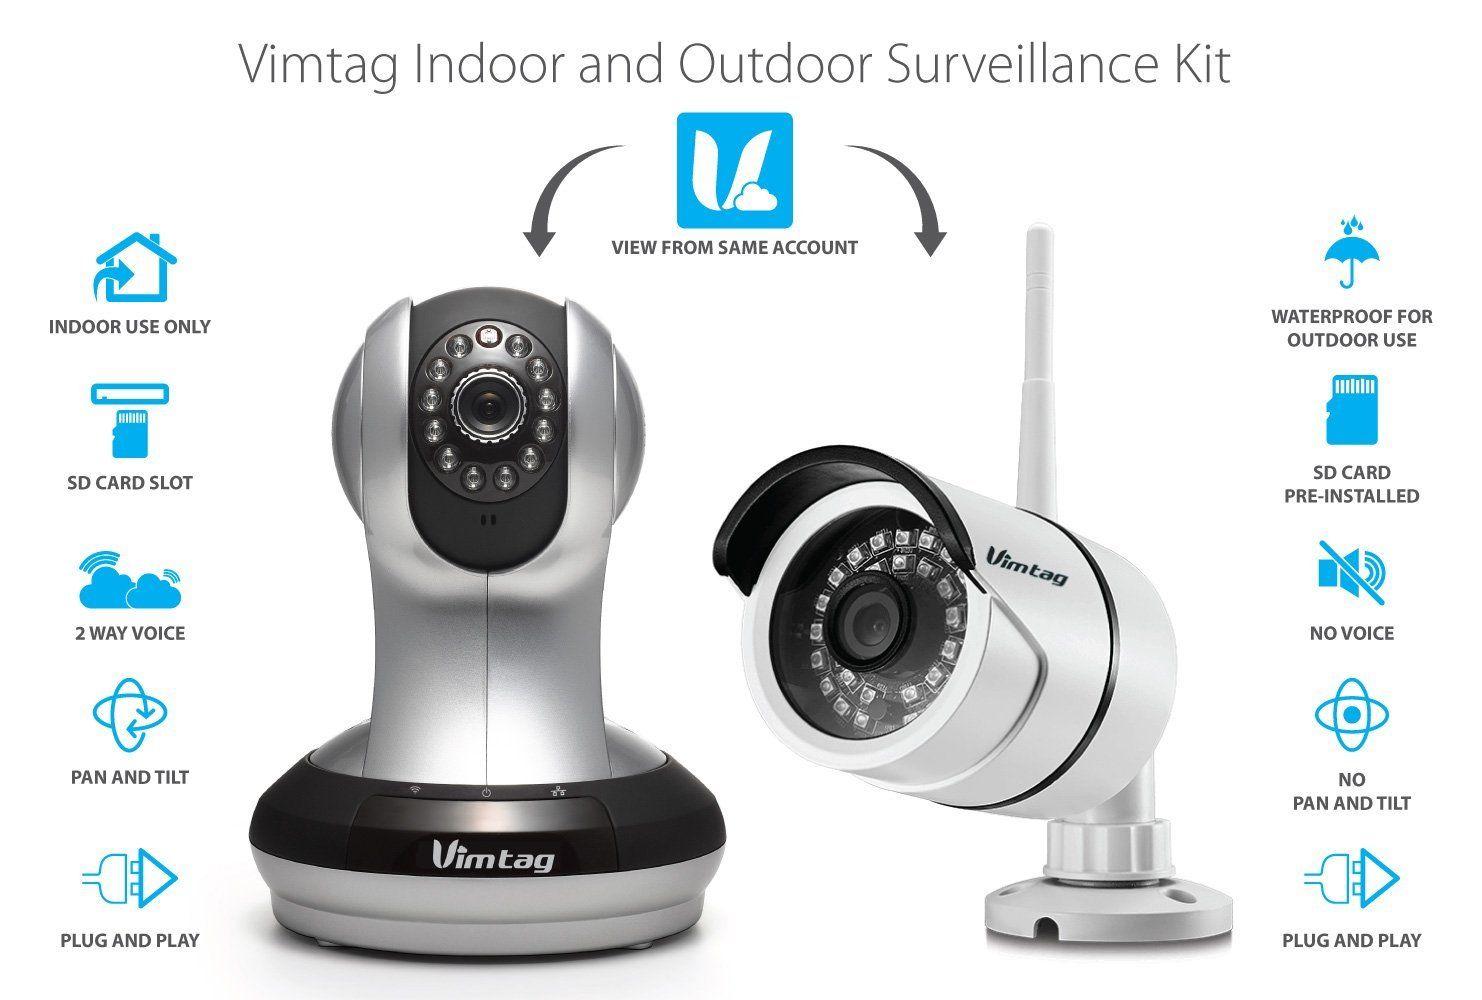 Vimtag 1 Pack Ind & Out Kit Indoor & Outdoor Surveillance Kit ...